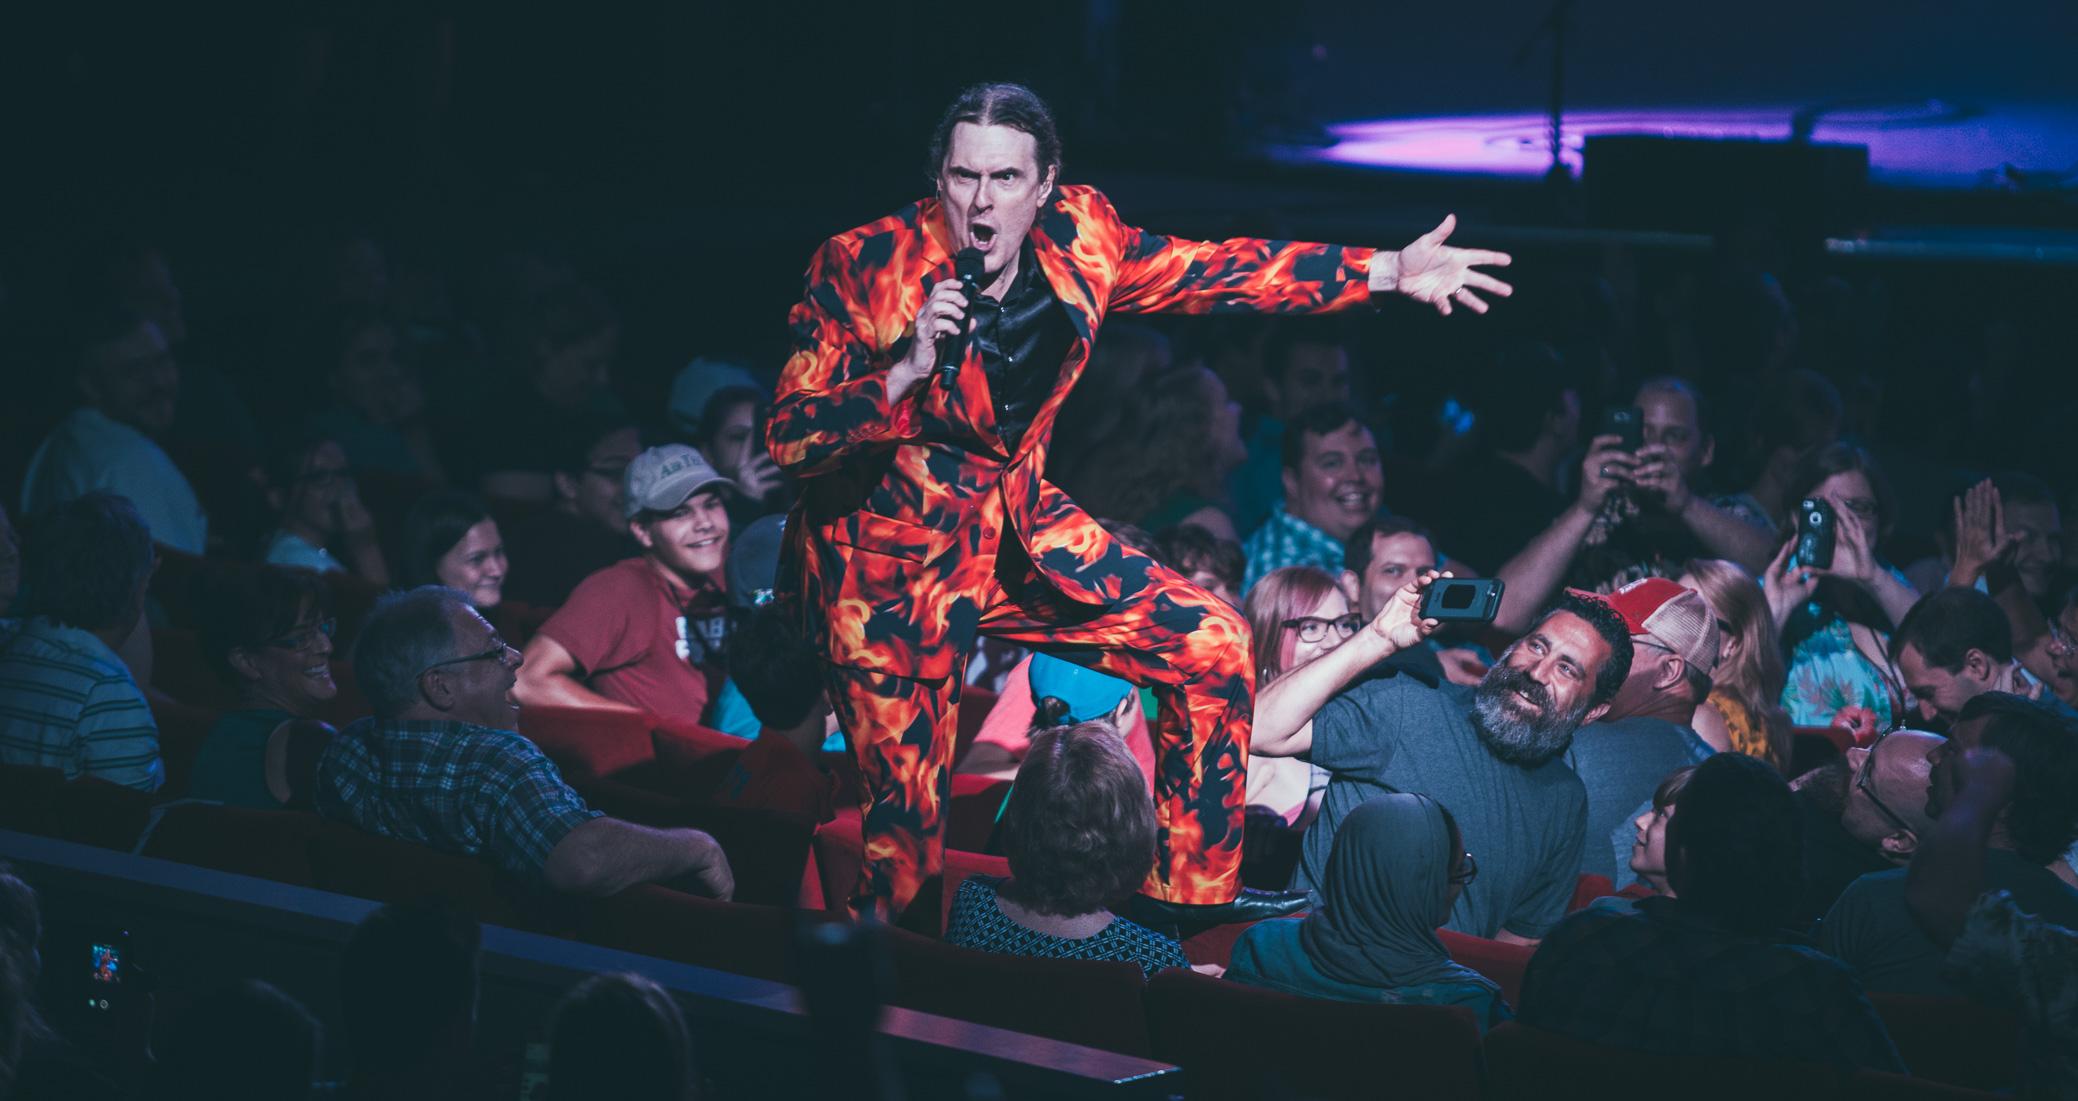 Weird Al Yankovic Concert Photography